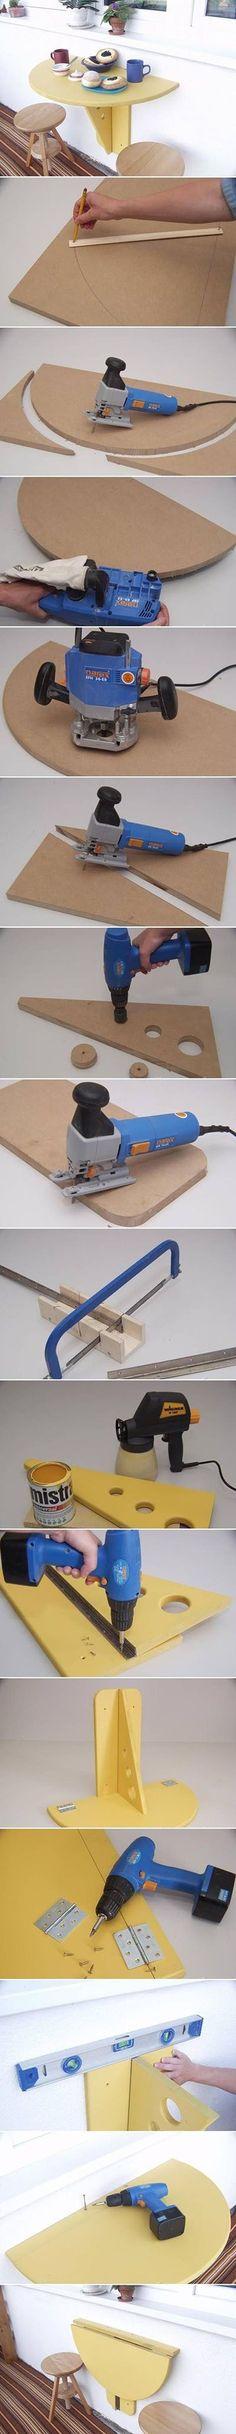 DIY Balcony Folding Table | DIY  Crafts Tutorials